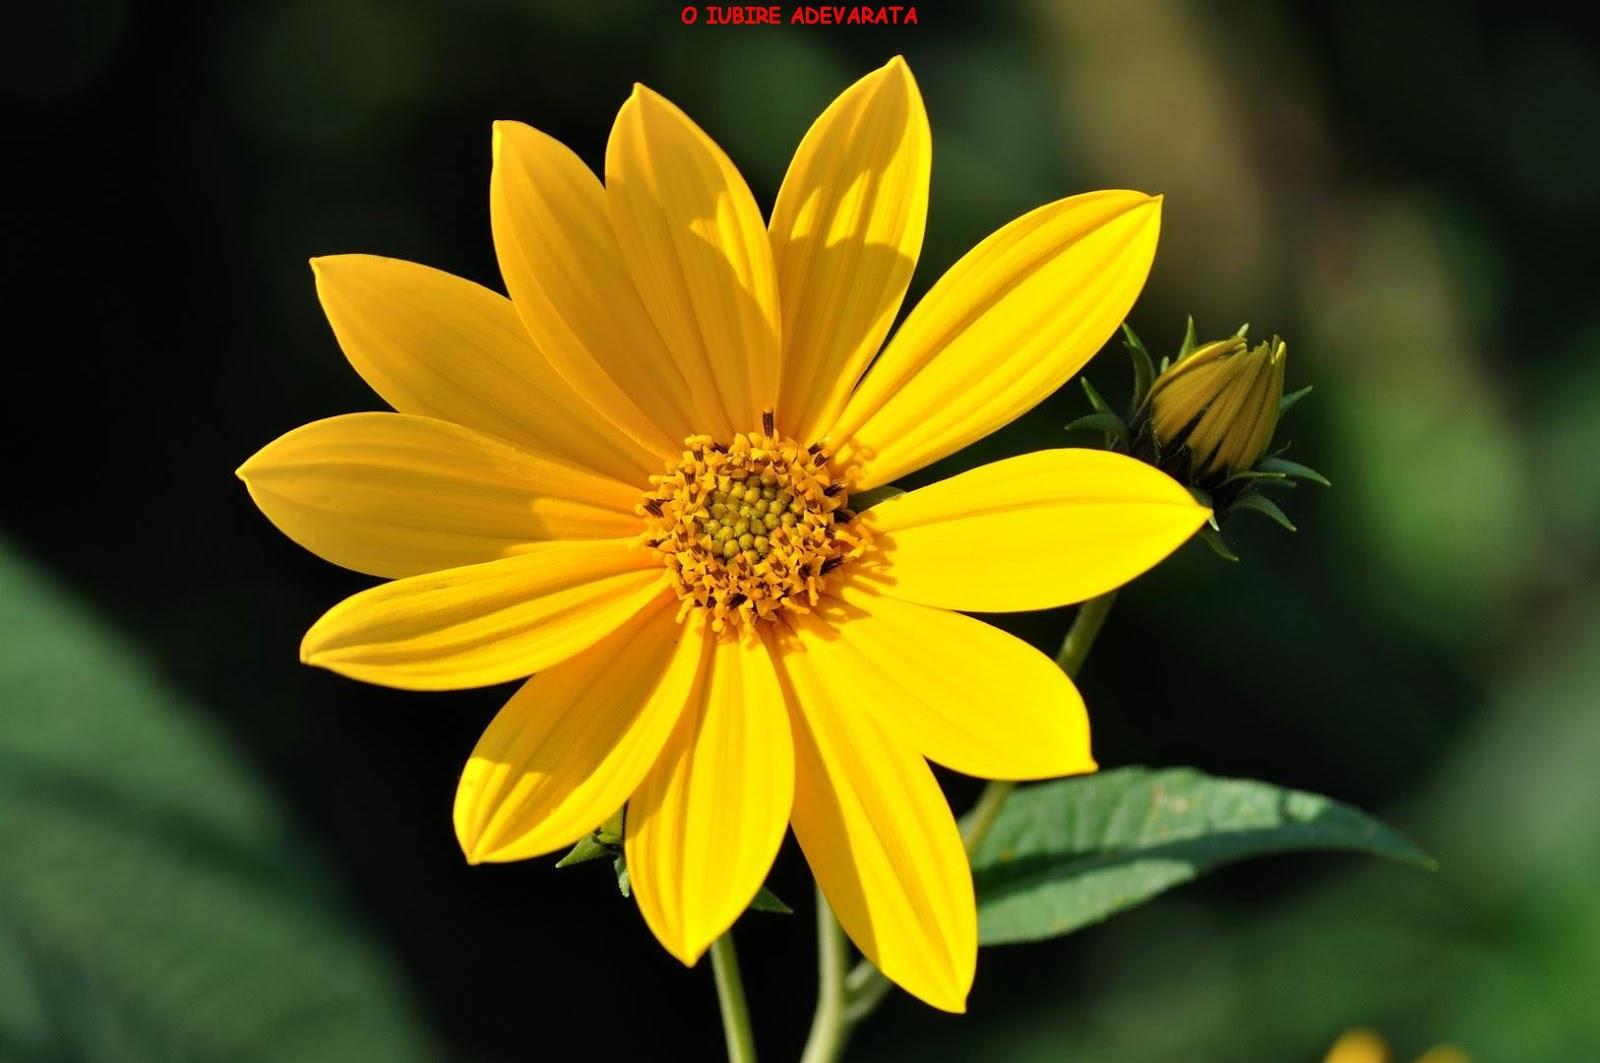 Flori Imagini 31 Mesaje Dragoste Poze